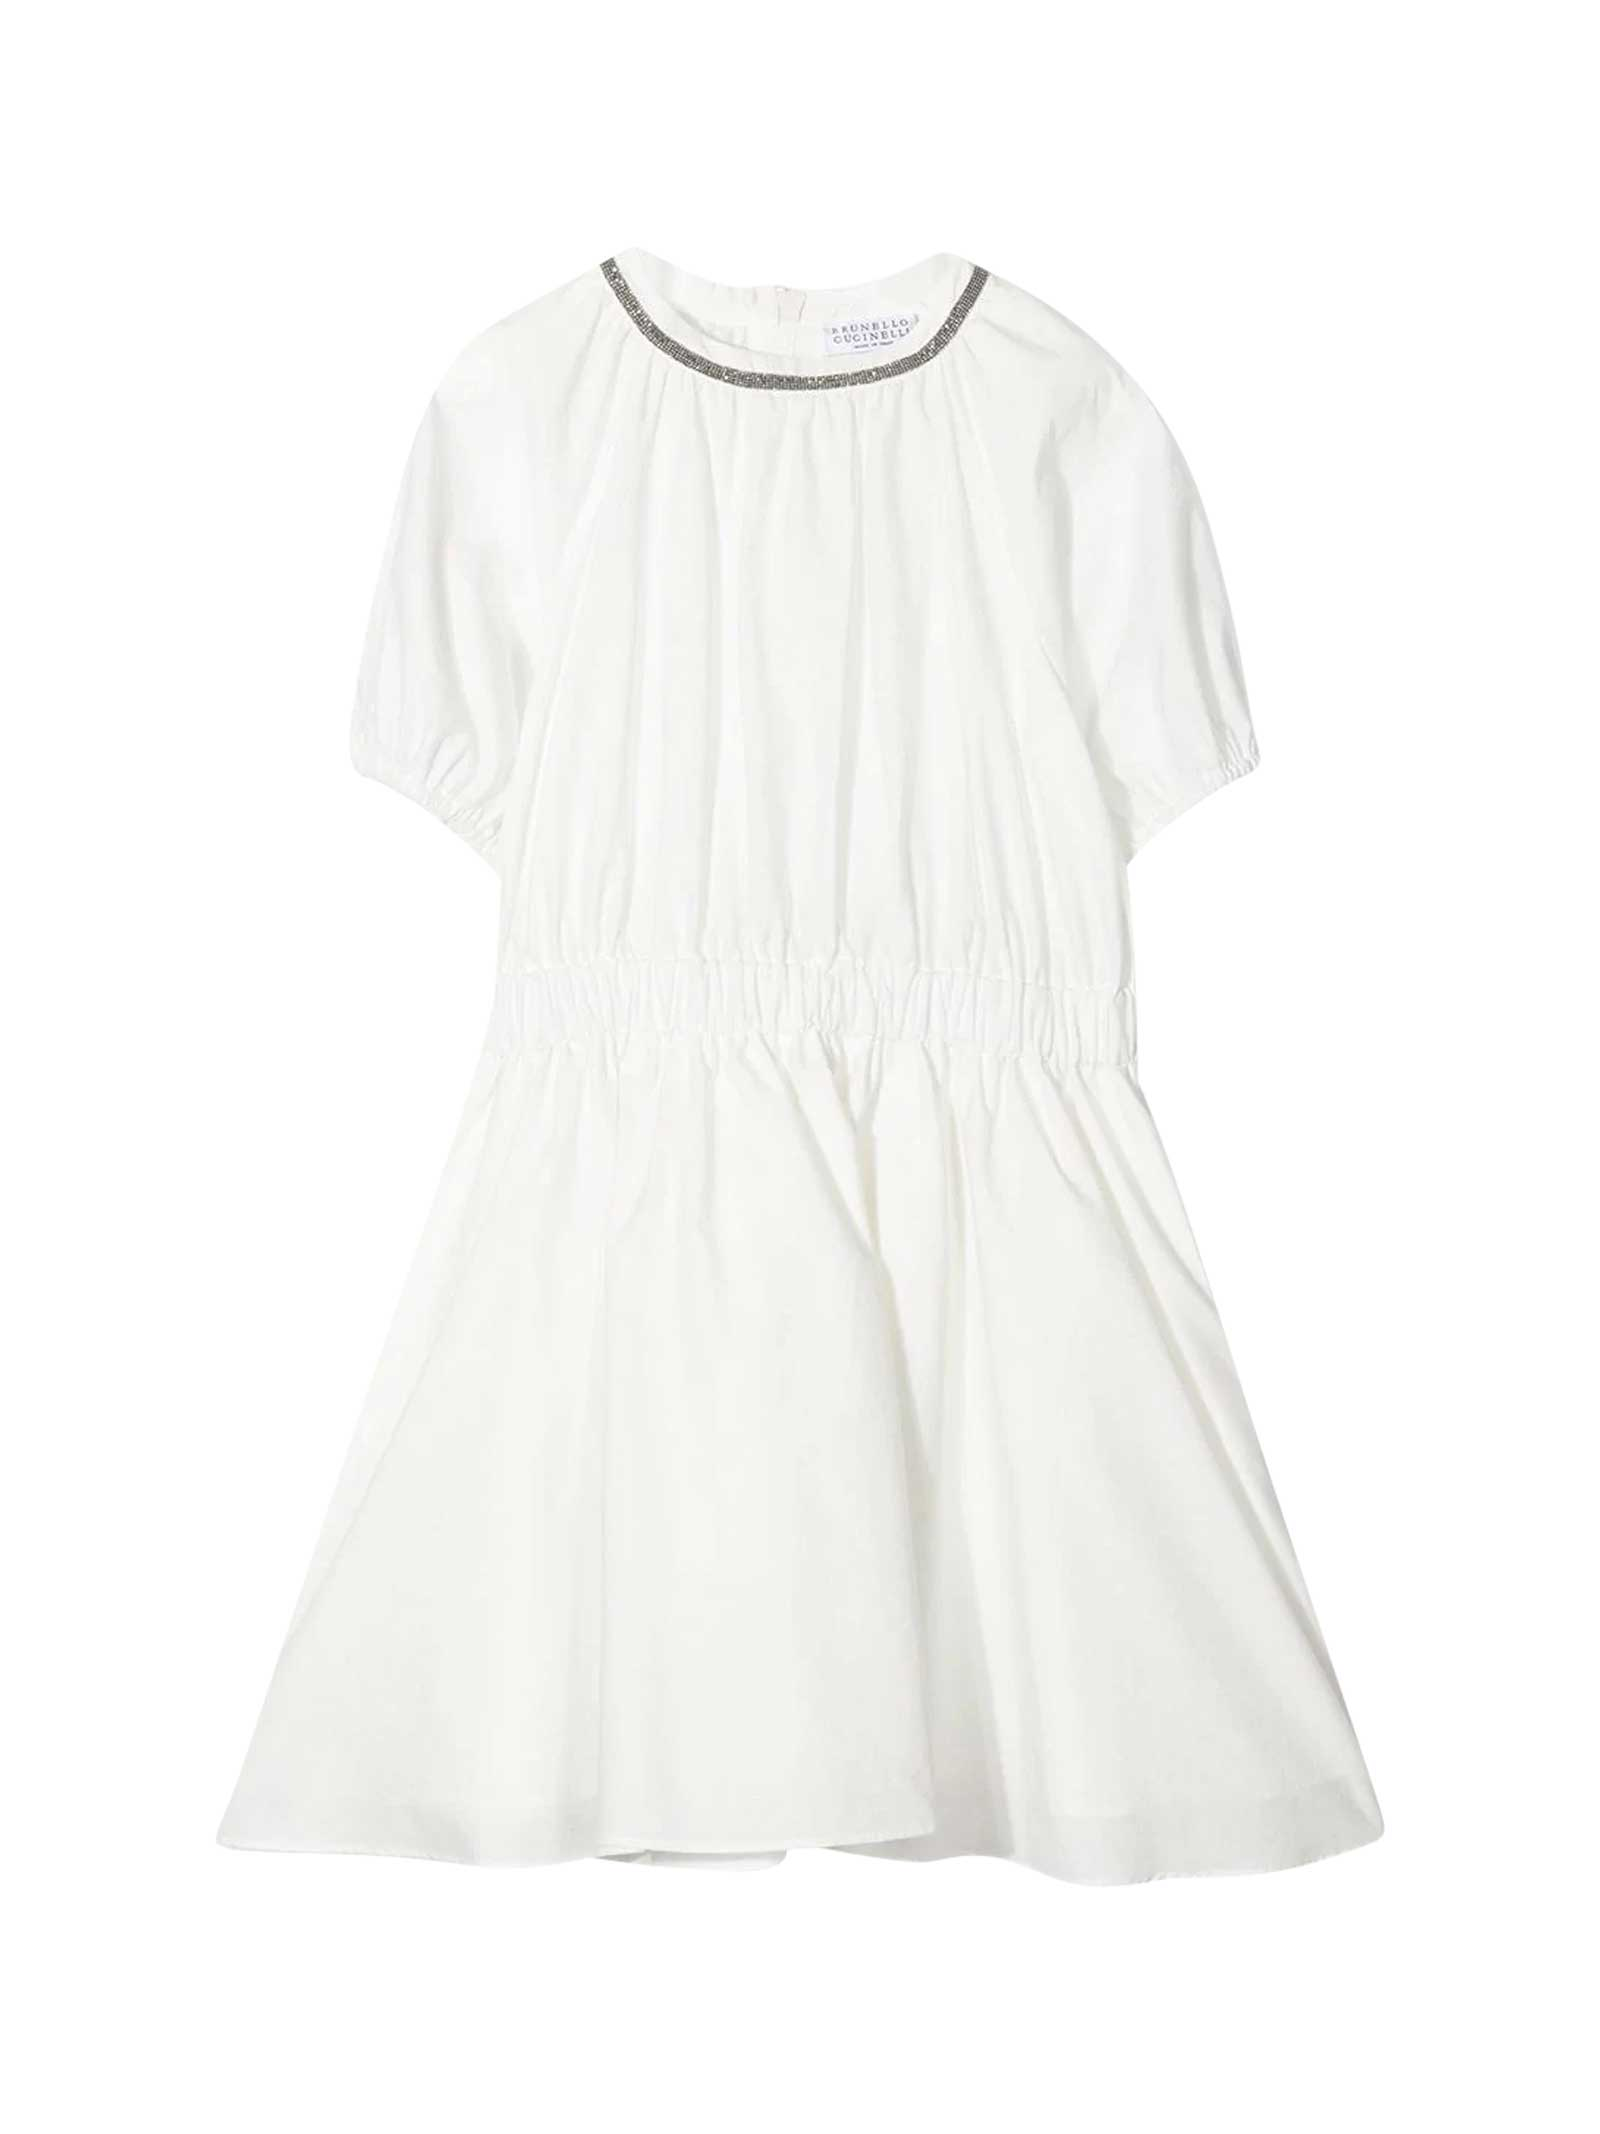 Brunello Cucinelli Cottons WHITE TEEN DRESS